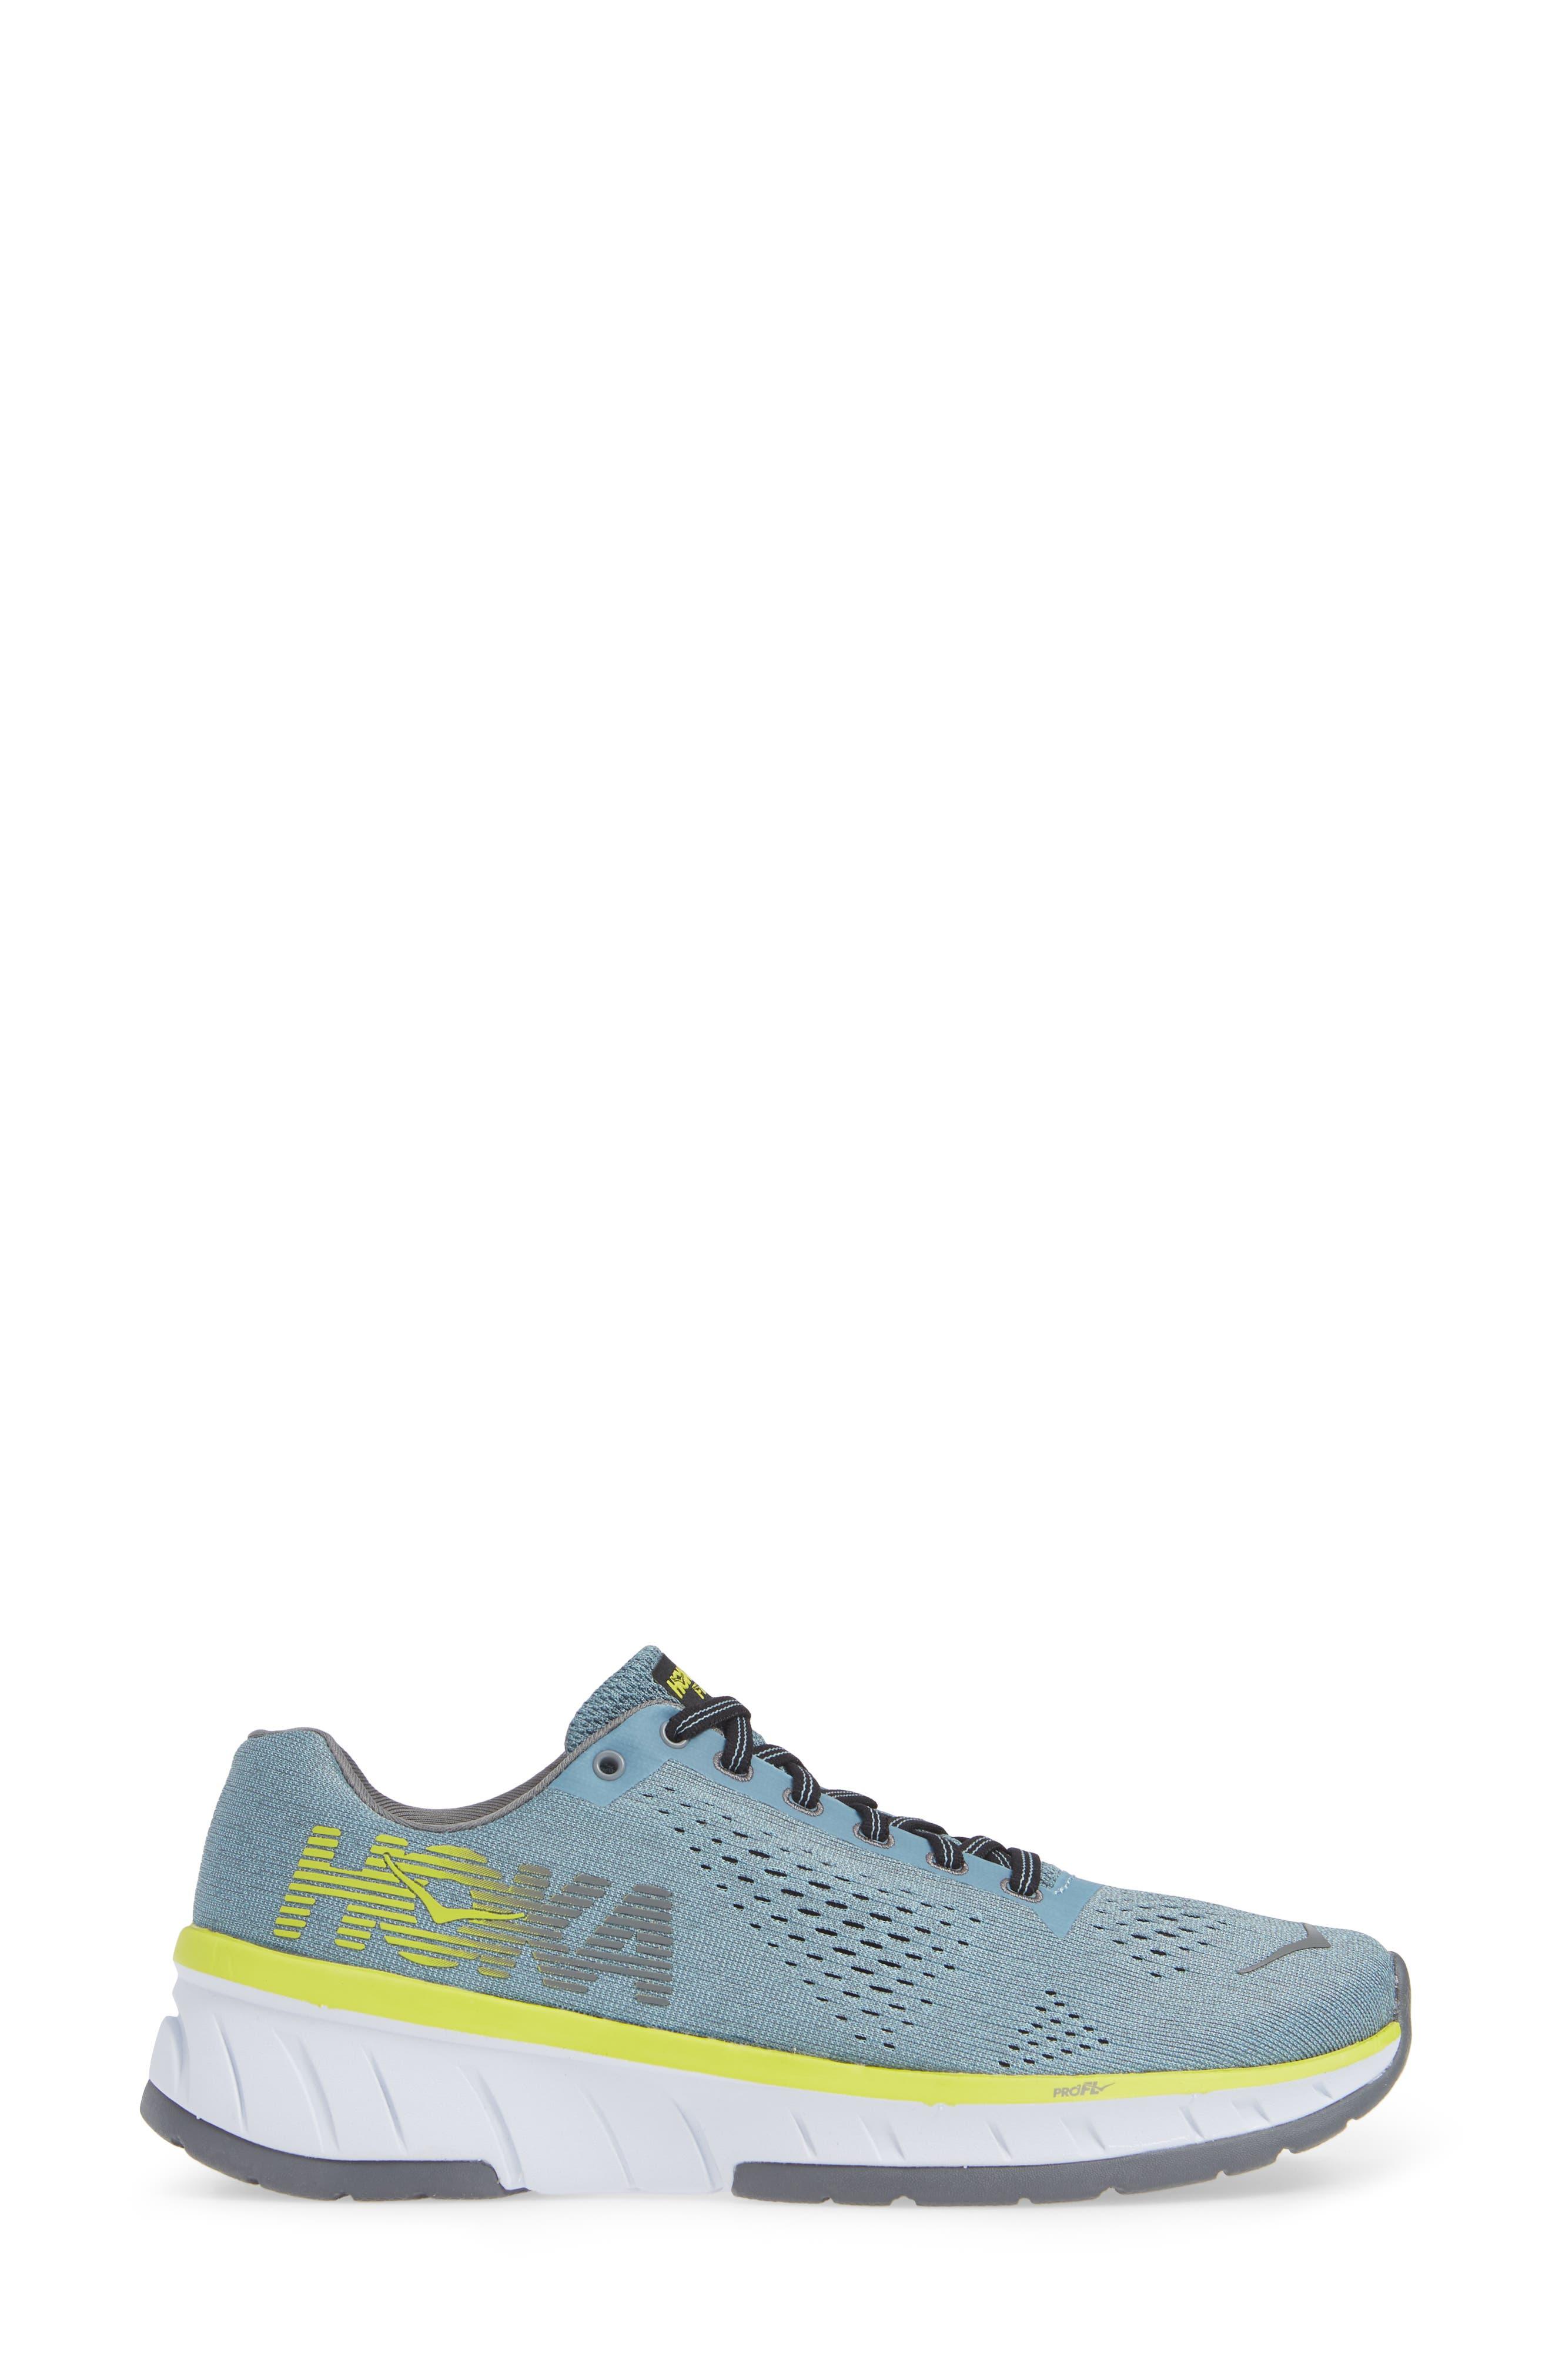 Cavu Running Shoe,                             Alternate thumbnail 3, color,                             SKY BLUE/ NEUTRAL GREY